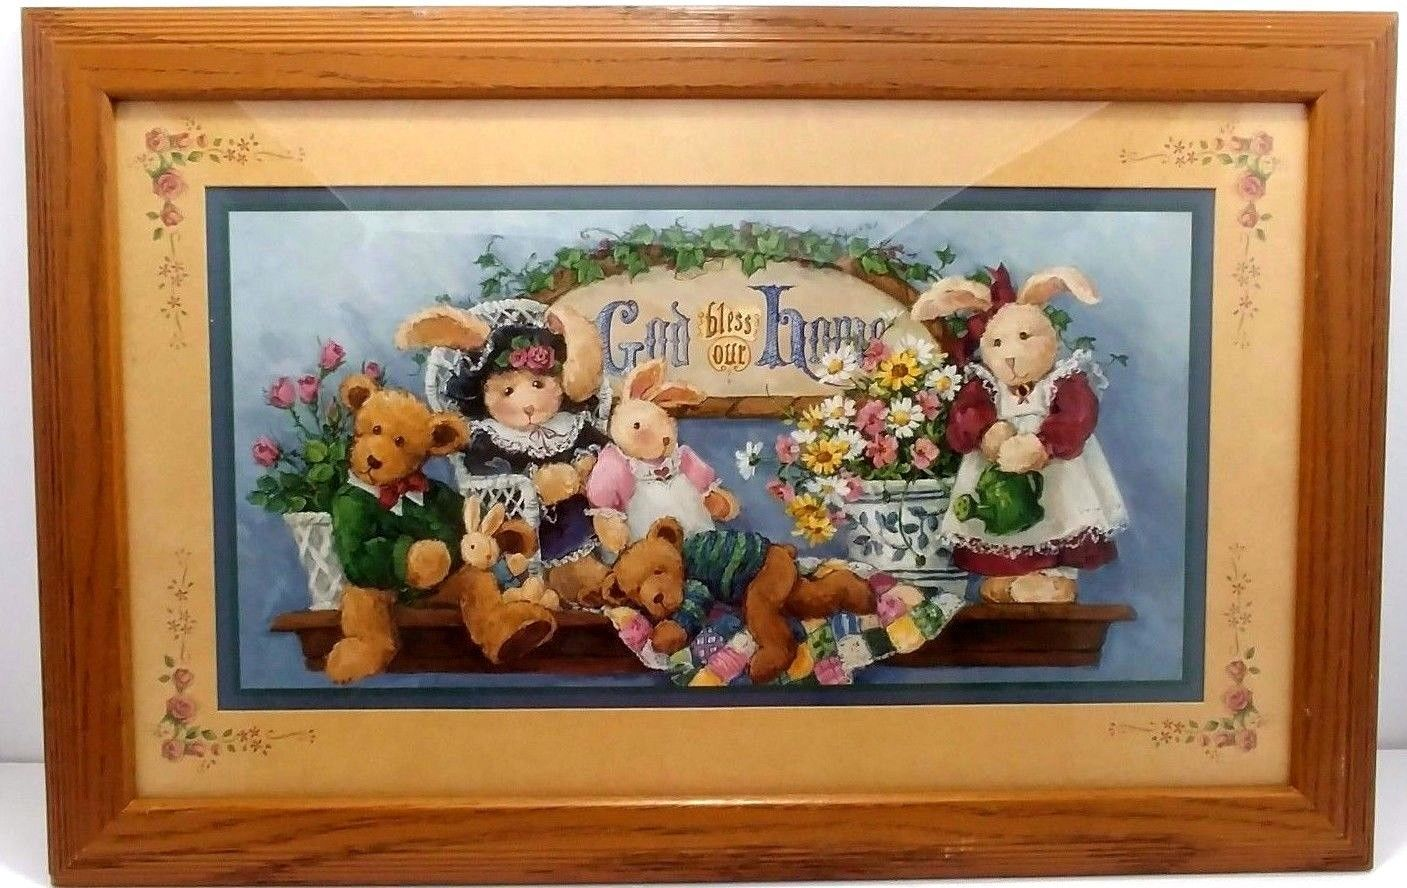 Home Interiors God Bless Our Home Homco Gifts Barbara Mock Teddy Bears Bunnies Ebay Homco